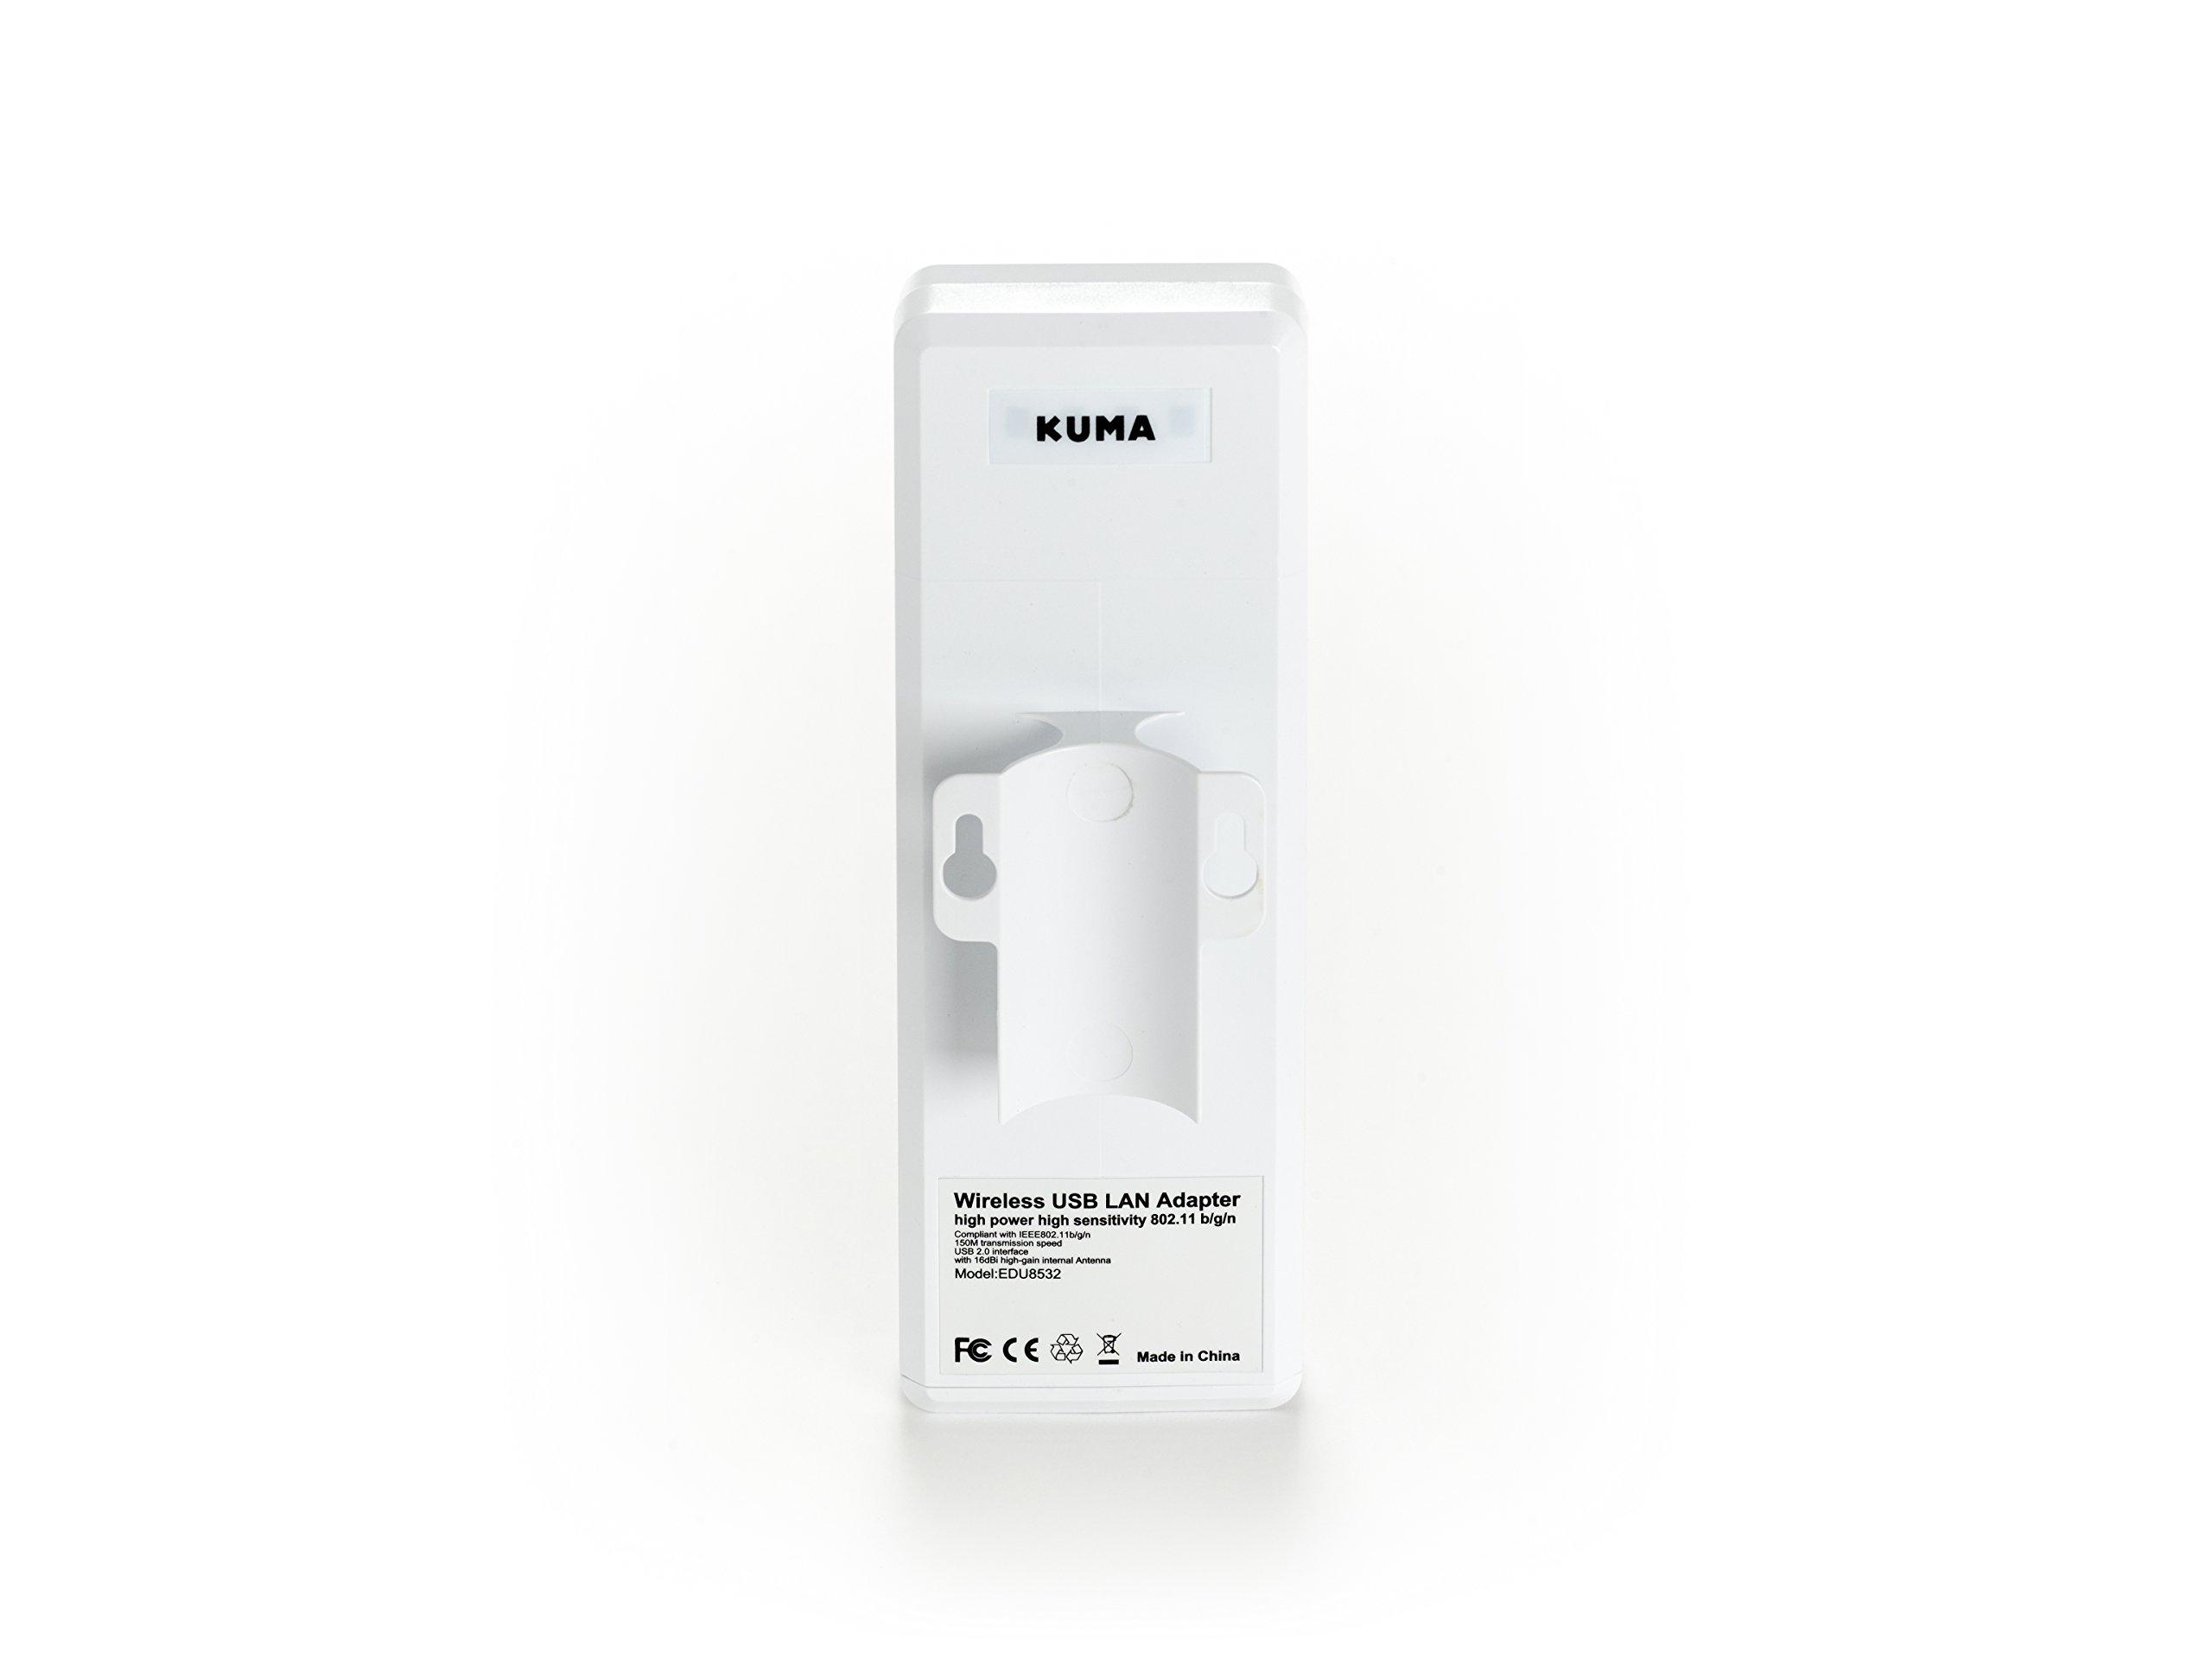 Kuma Hi-Gain Long Range Wireless Wifi Signal Booster Extender Hotspot Access Point Network Repeater for RVs, Motorhomes, Trucks & Boats by KUMA (Image #5)